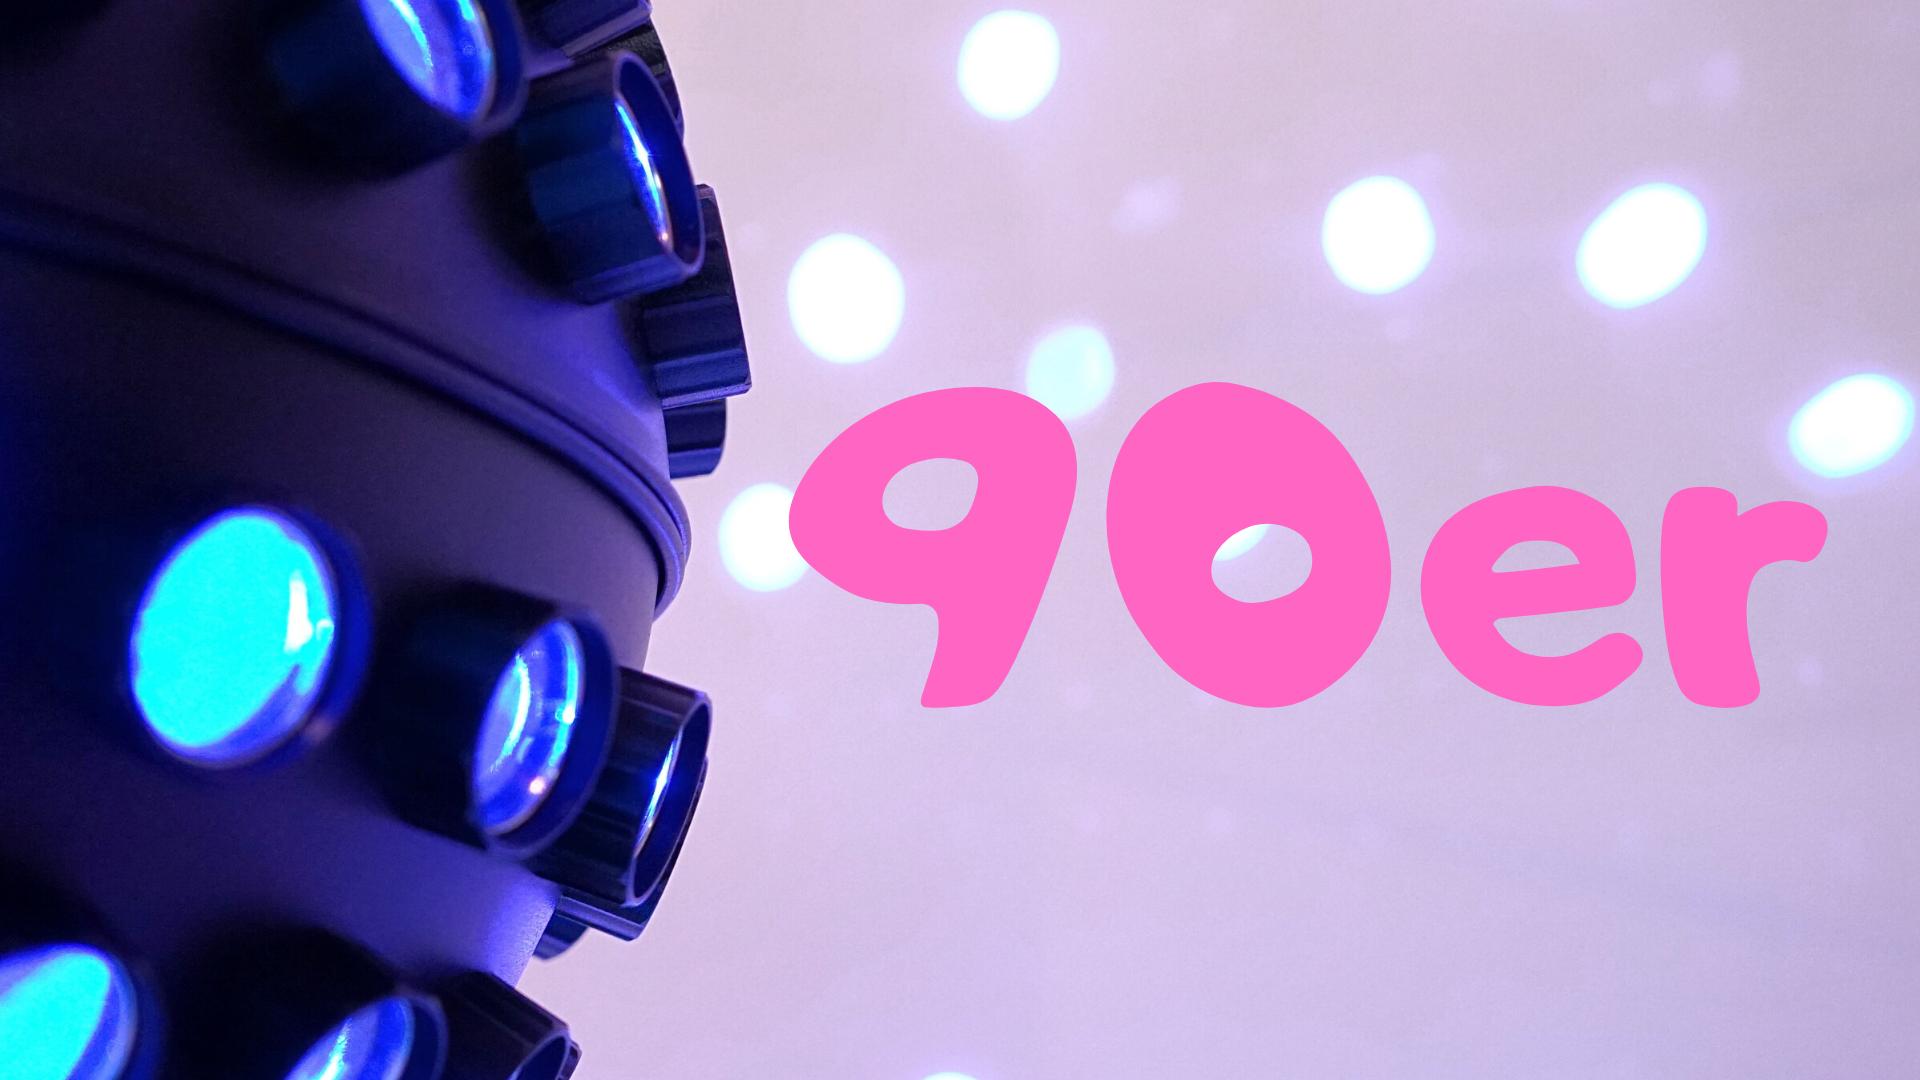 90er-jahre-party